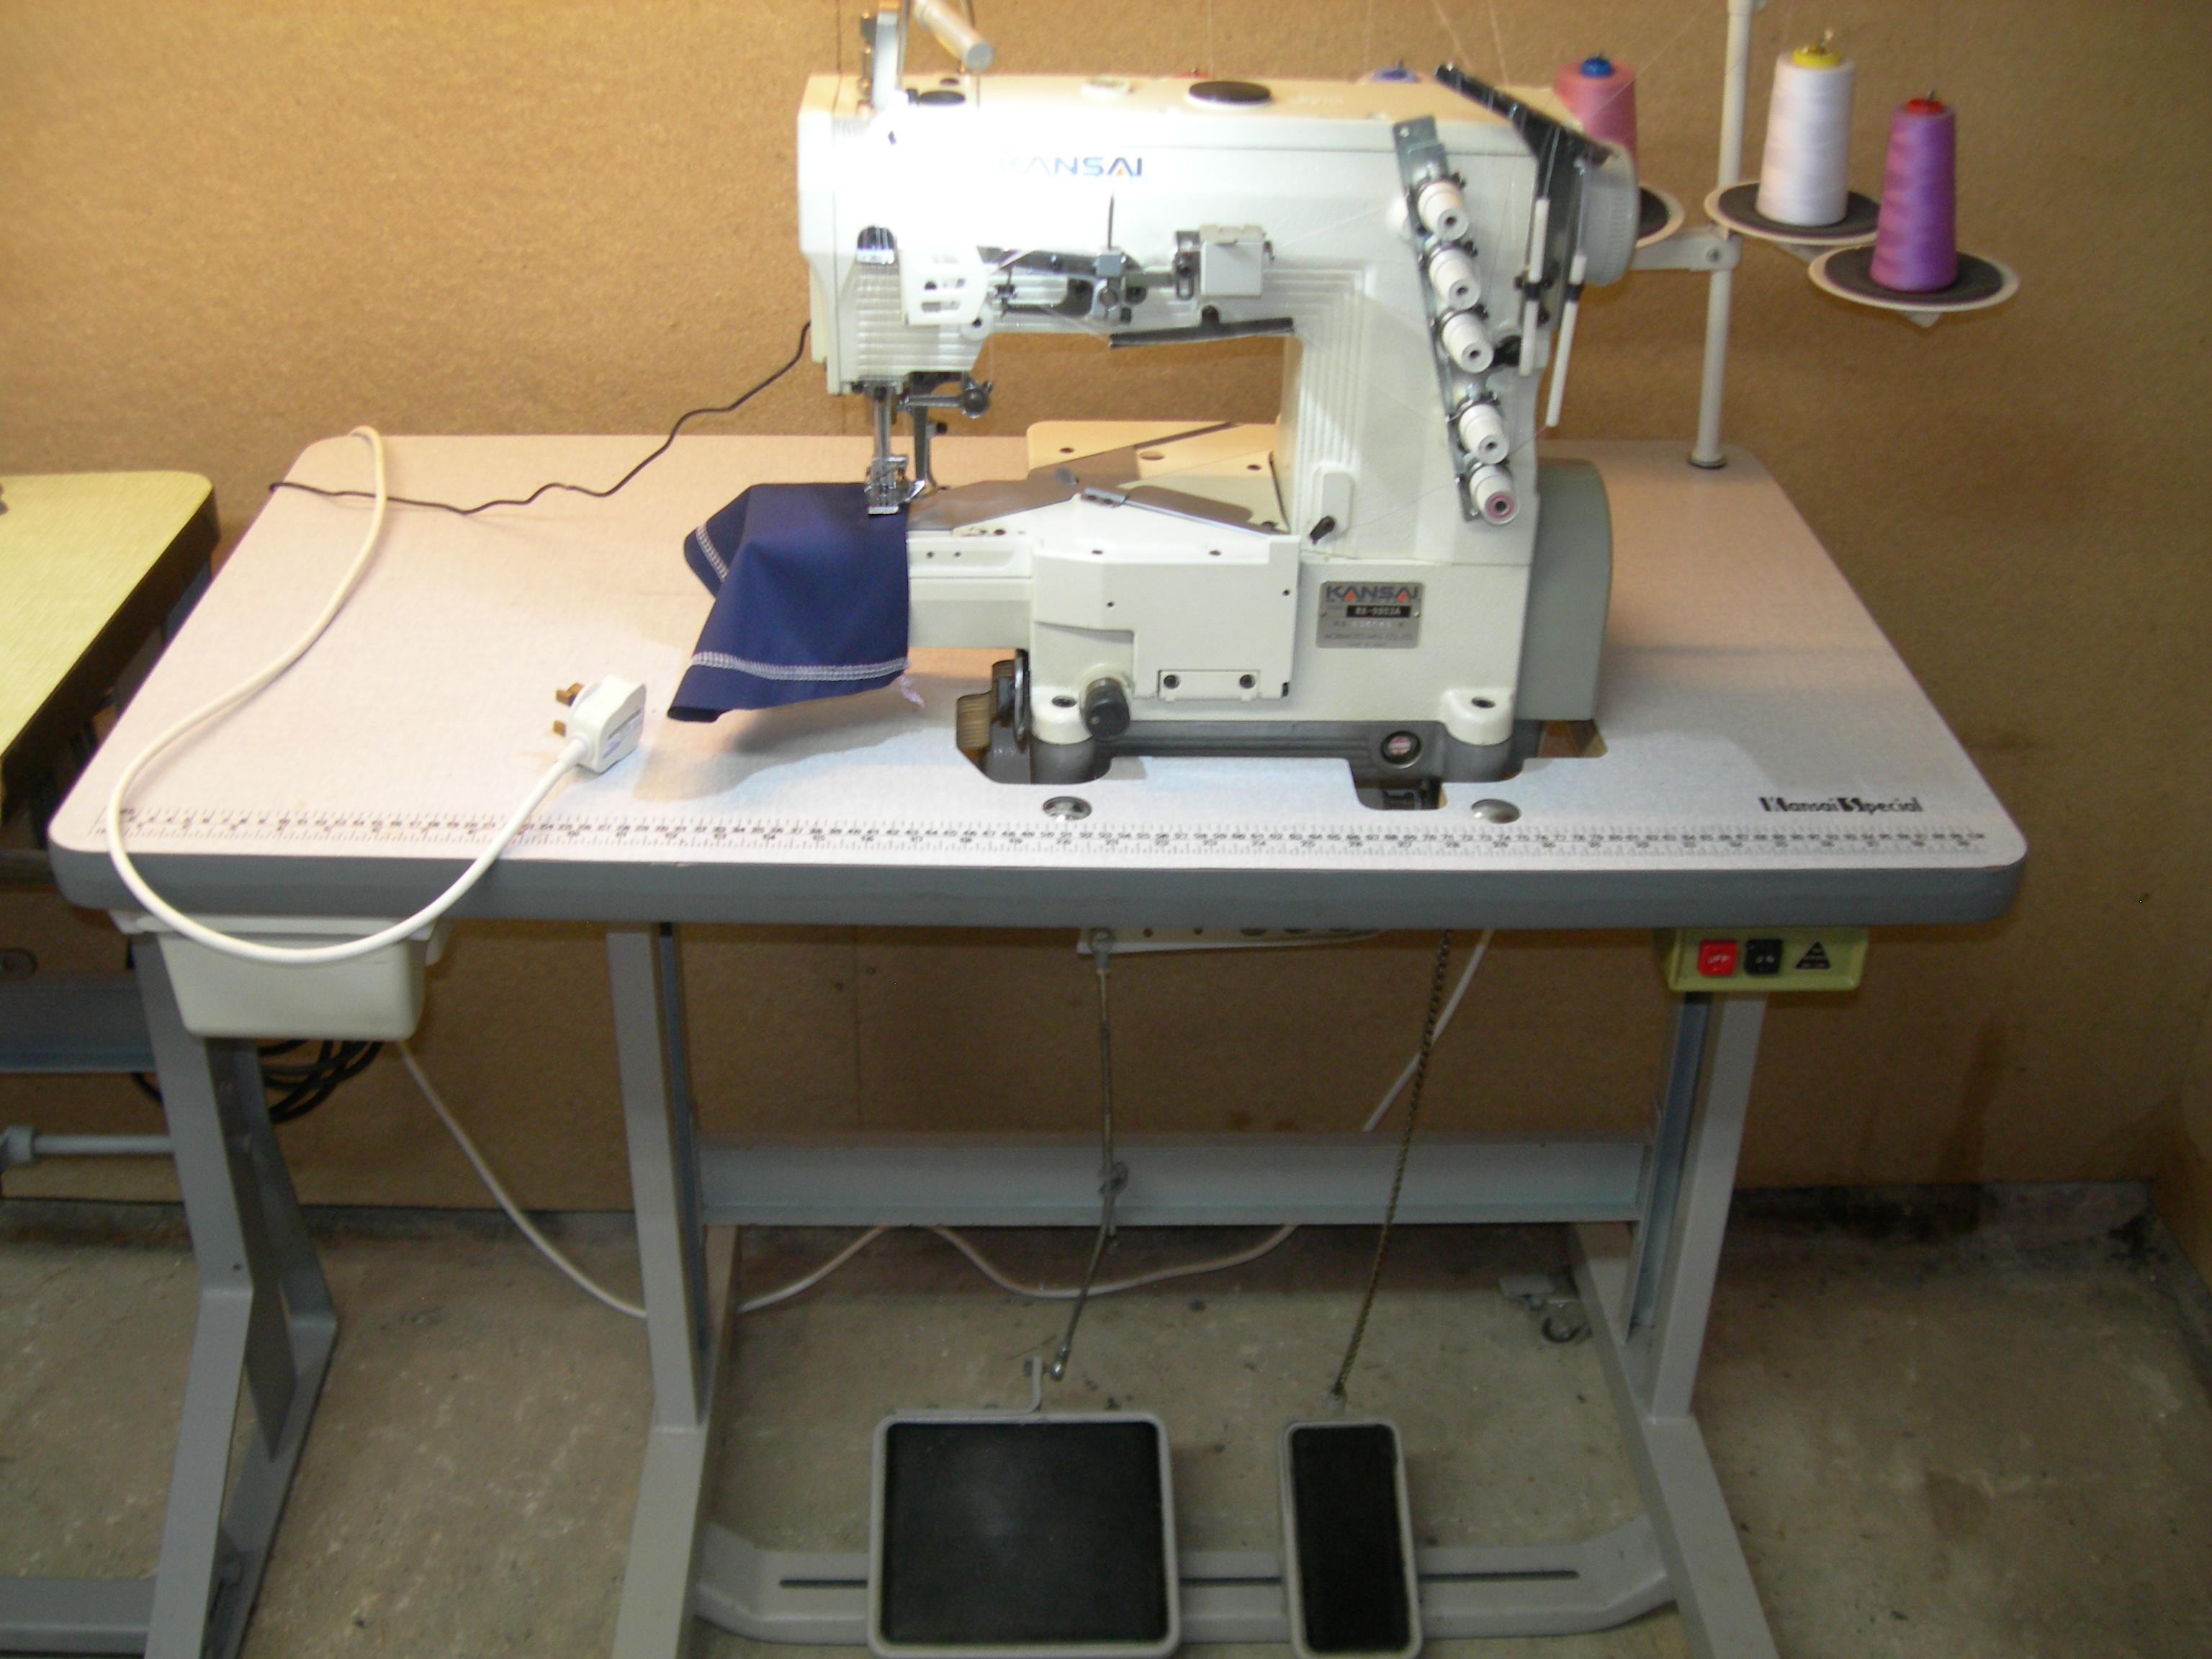 kansai coverstitch sewing machine